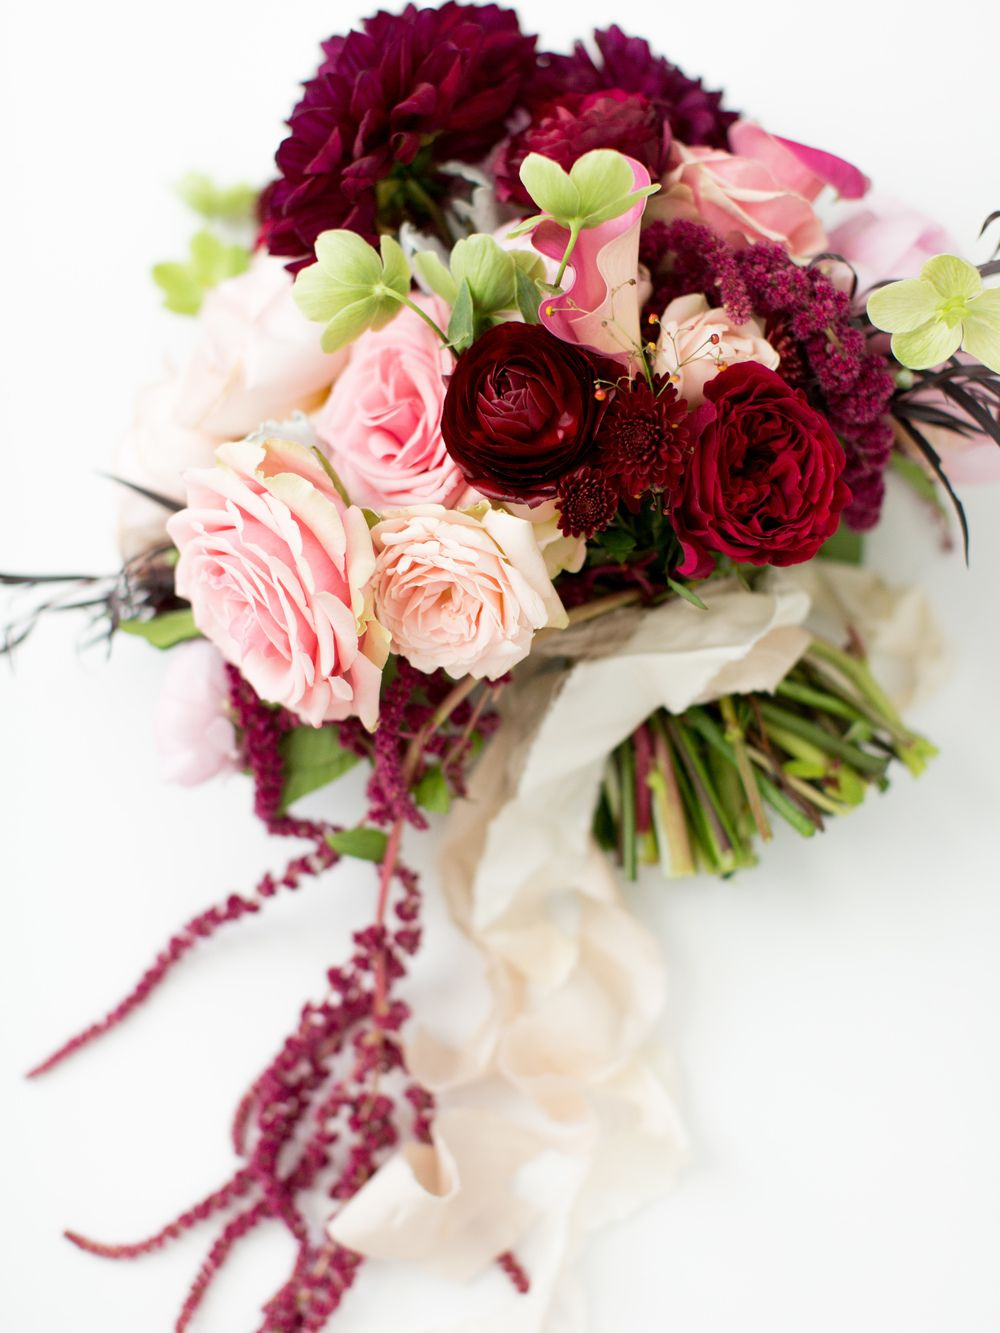 Late Spring Burgandy Pink Dahlia Rose South